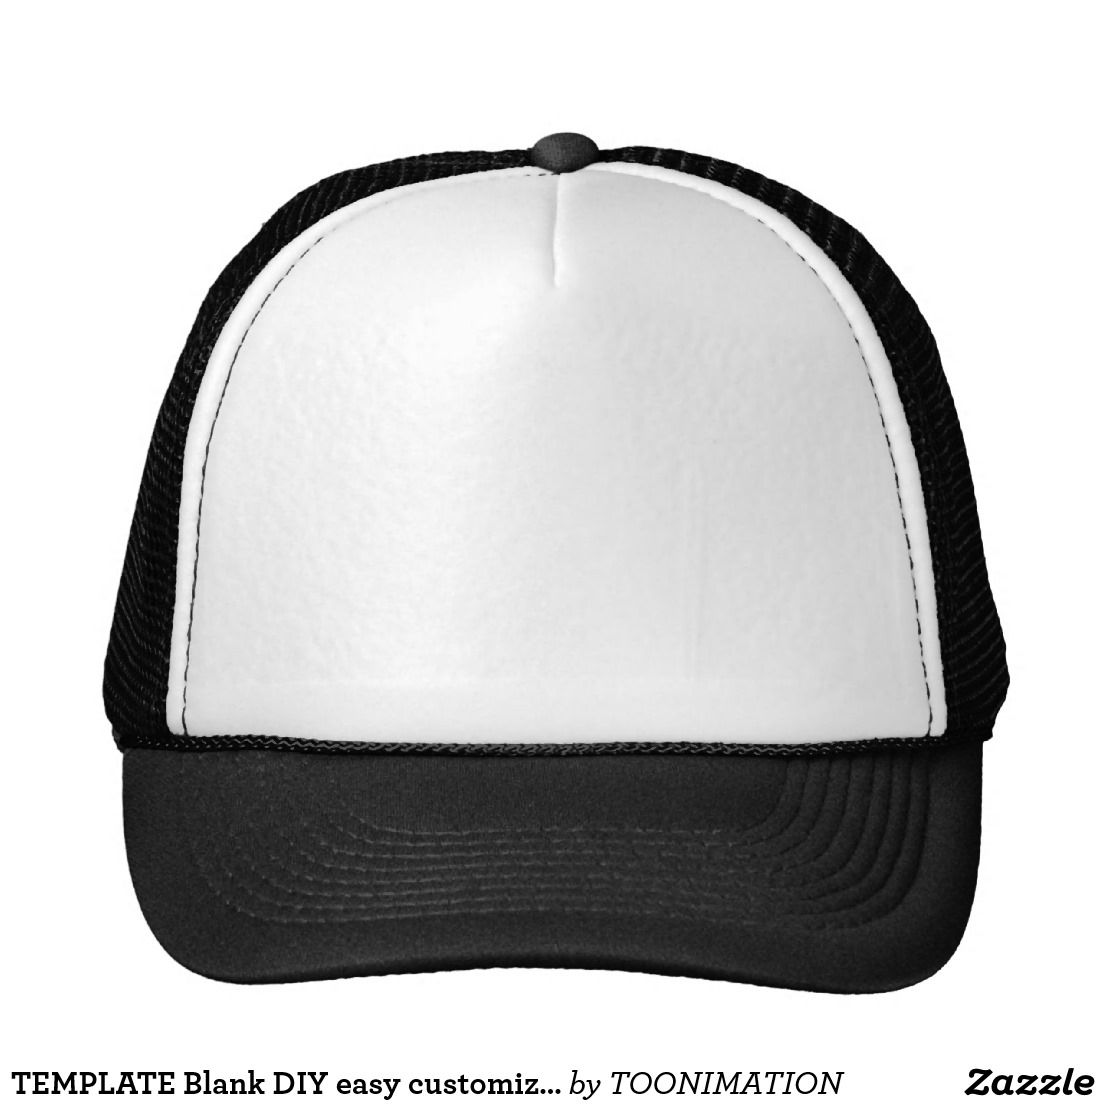 Template Blank Diy Easy Customize Add Text Photo Trucker Hat Zazzle Com In 2021 Trucker Hat Add Text Photo Trucker